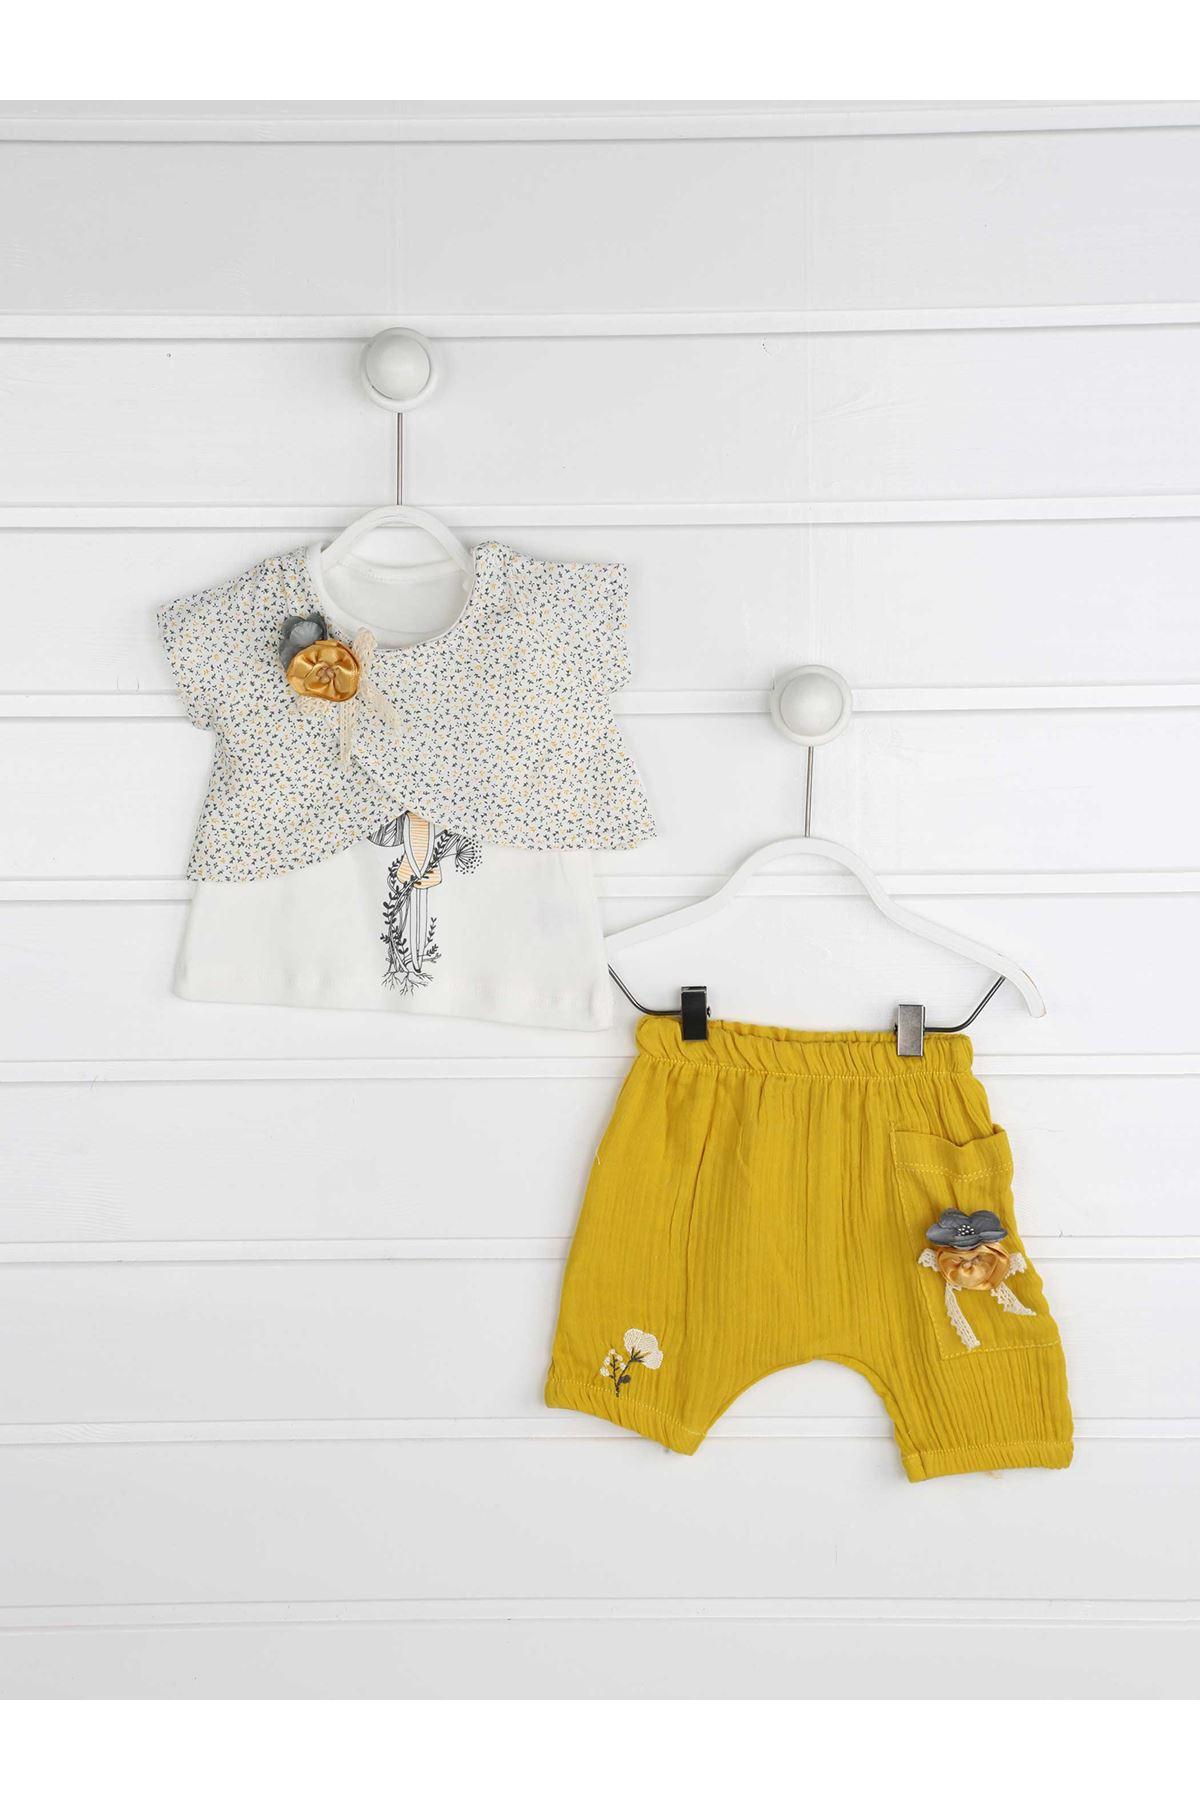 Yellow Summer Baby Girl Suit